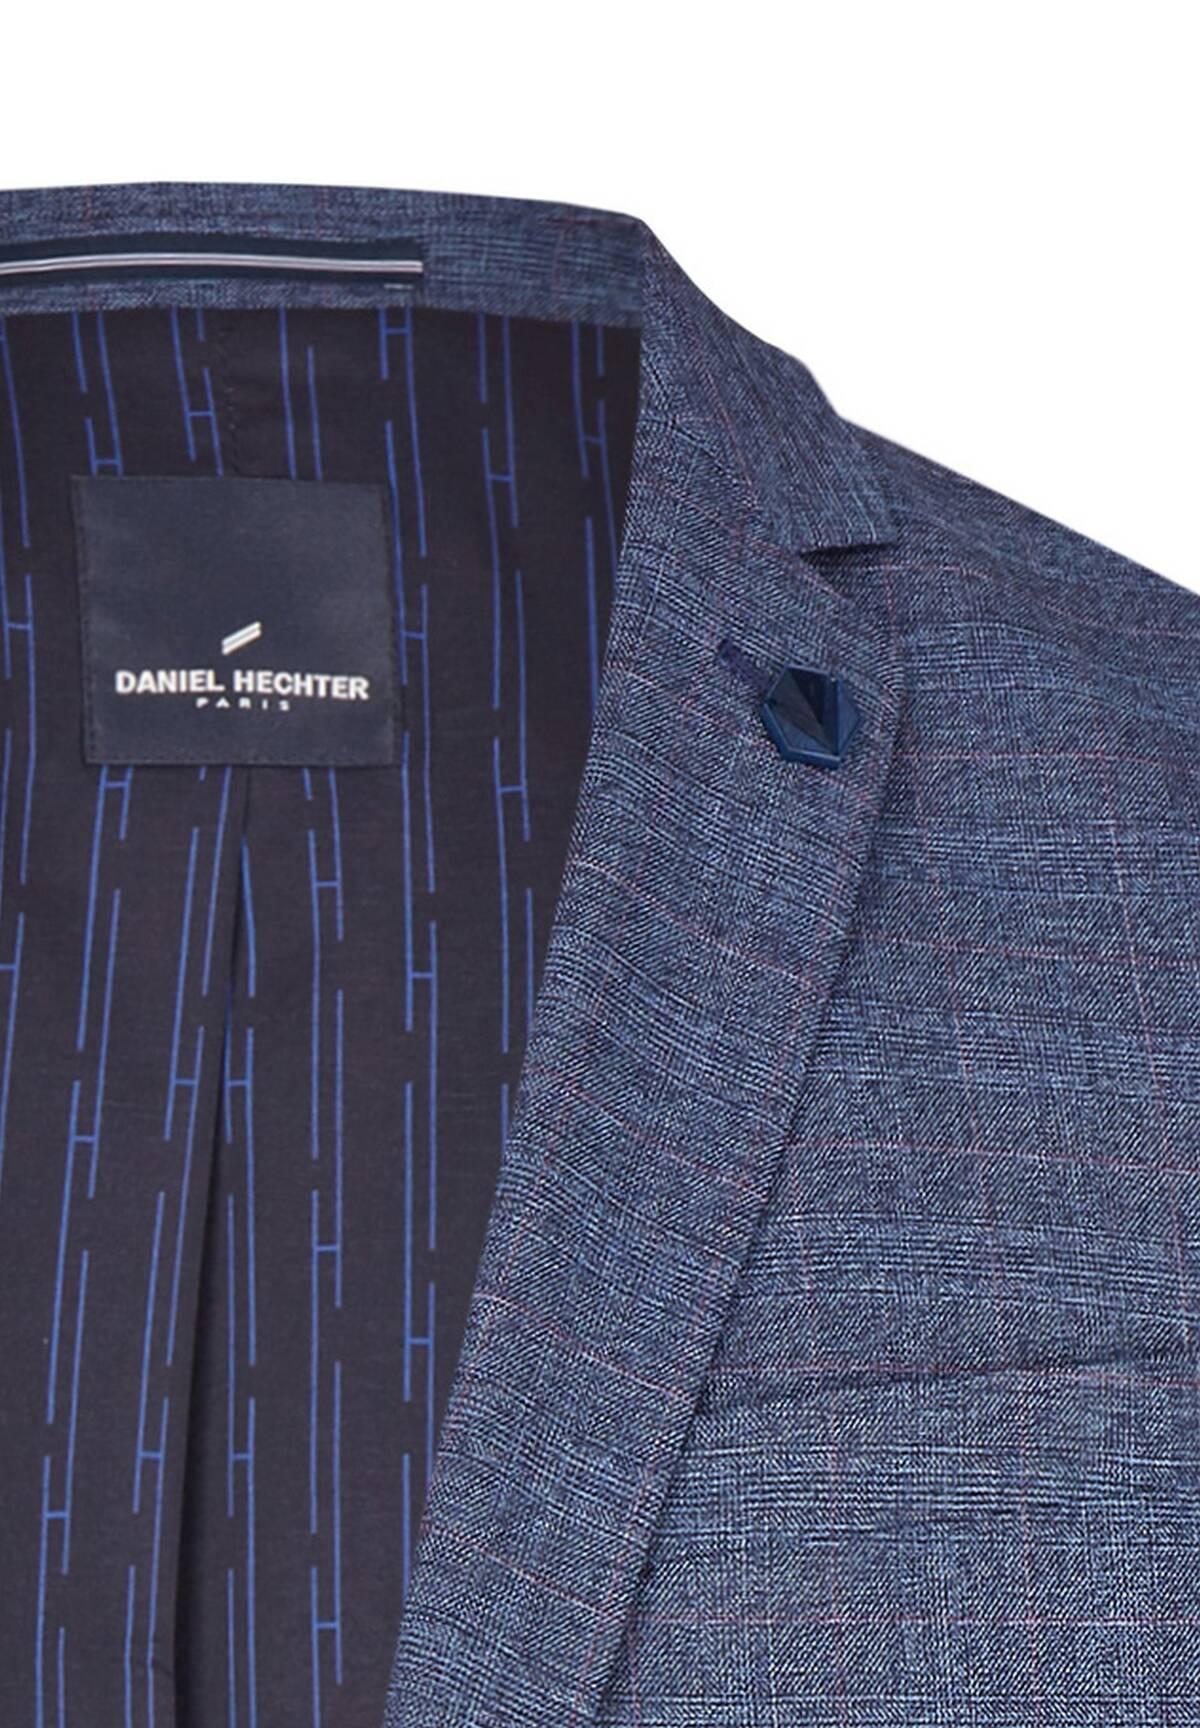 DH-XTension Anzug-Sakko / JACKET SHAPE DH-X